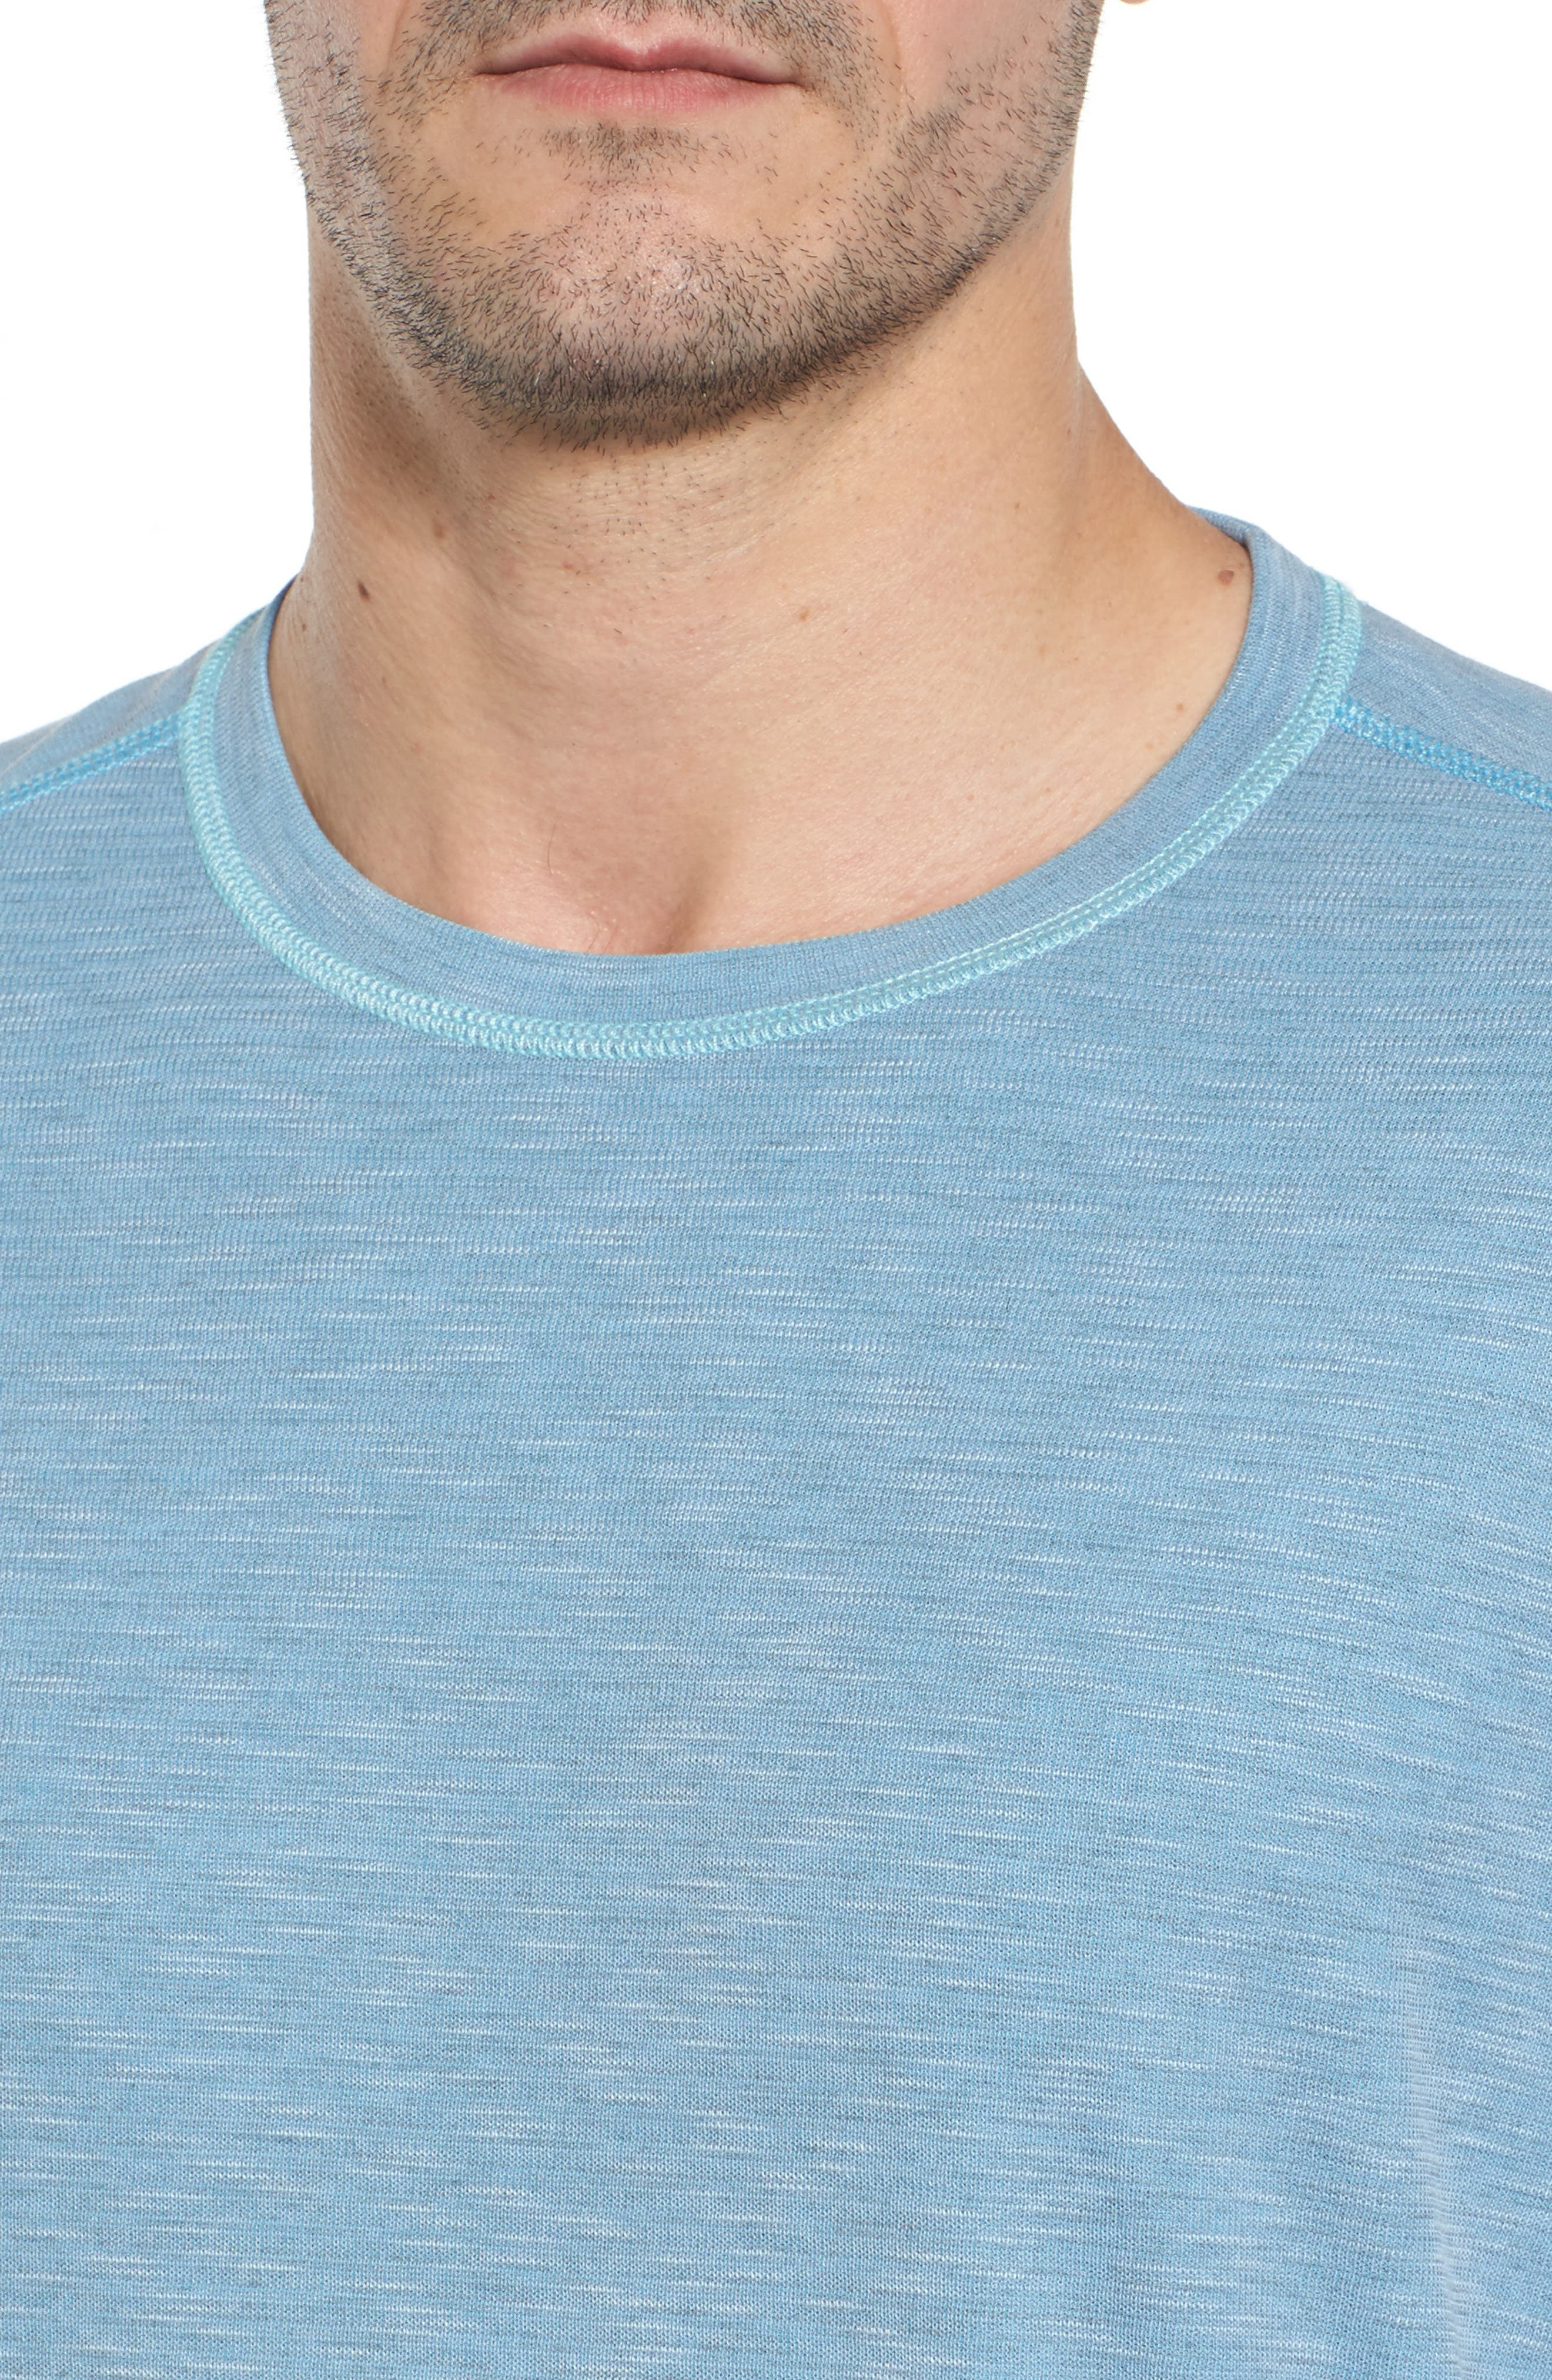 Flip Tide T-Shirt,                             Alternate thumbnail 39, color,